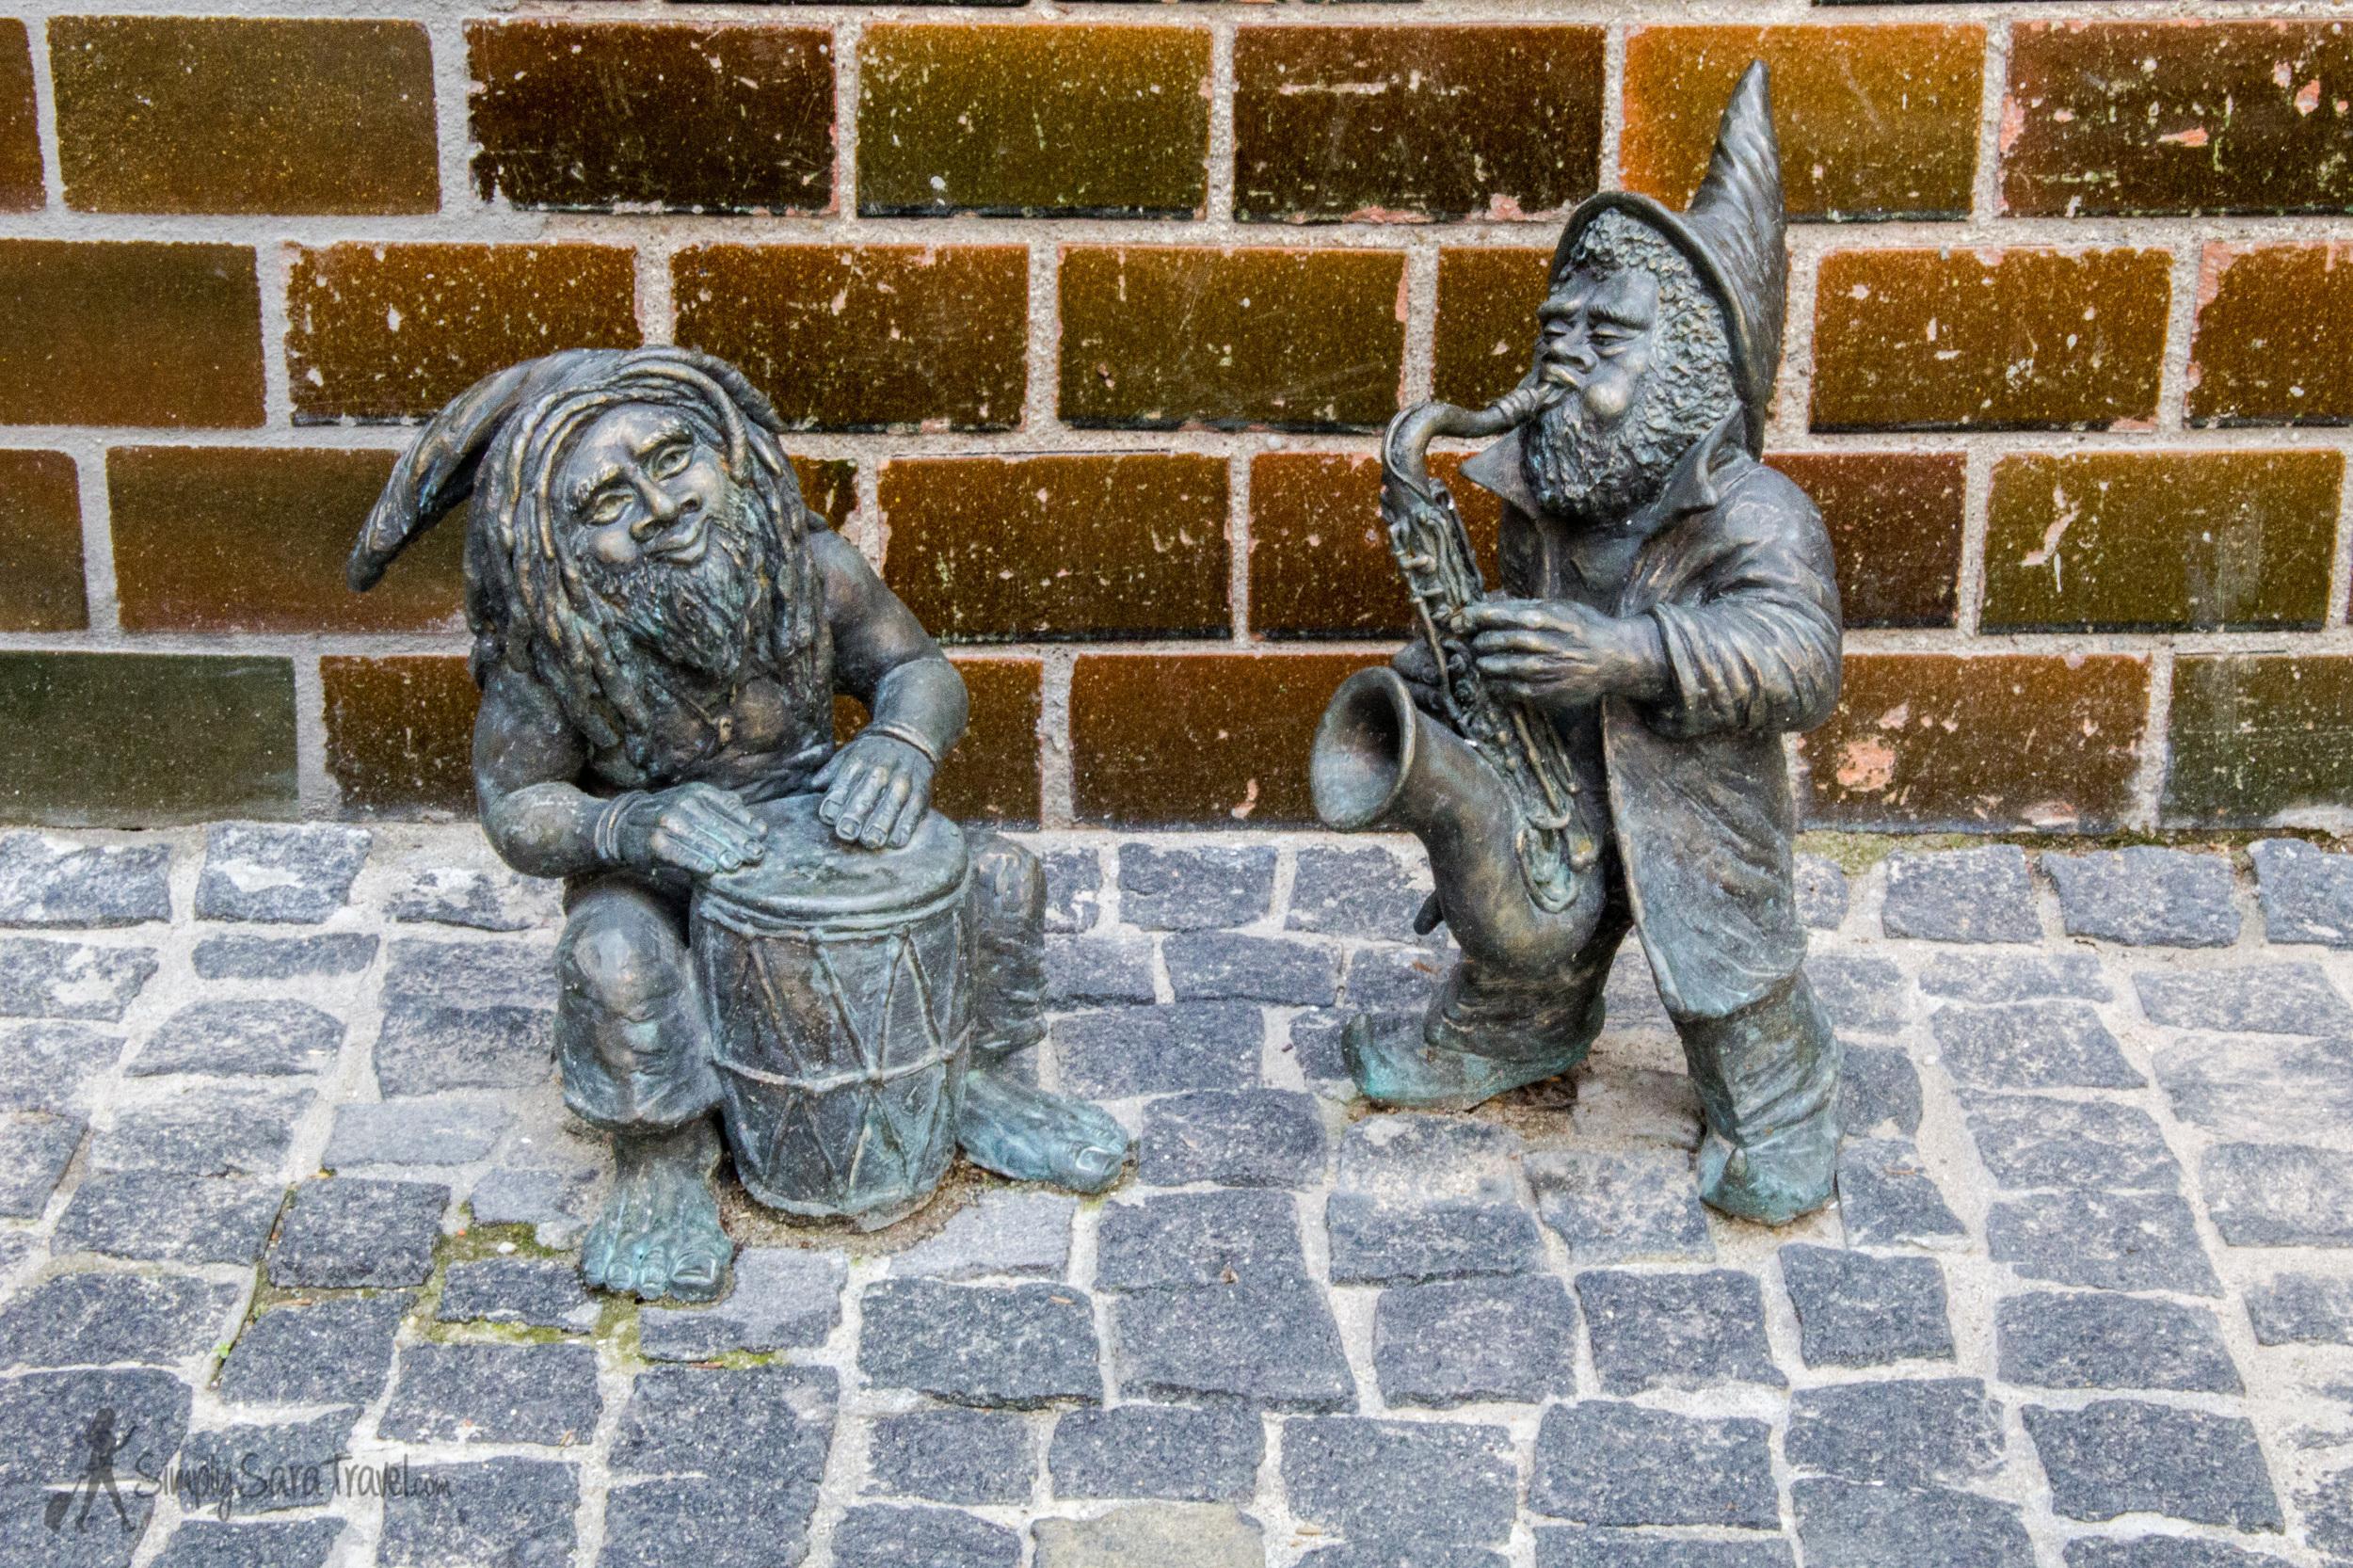 Musician gnomes in Wroclaw, Poland